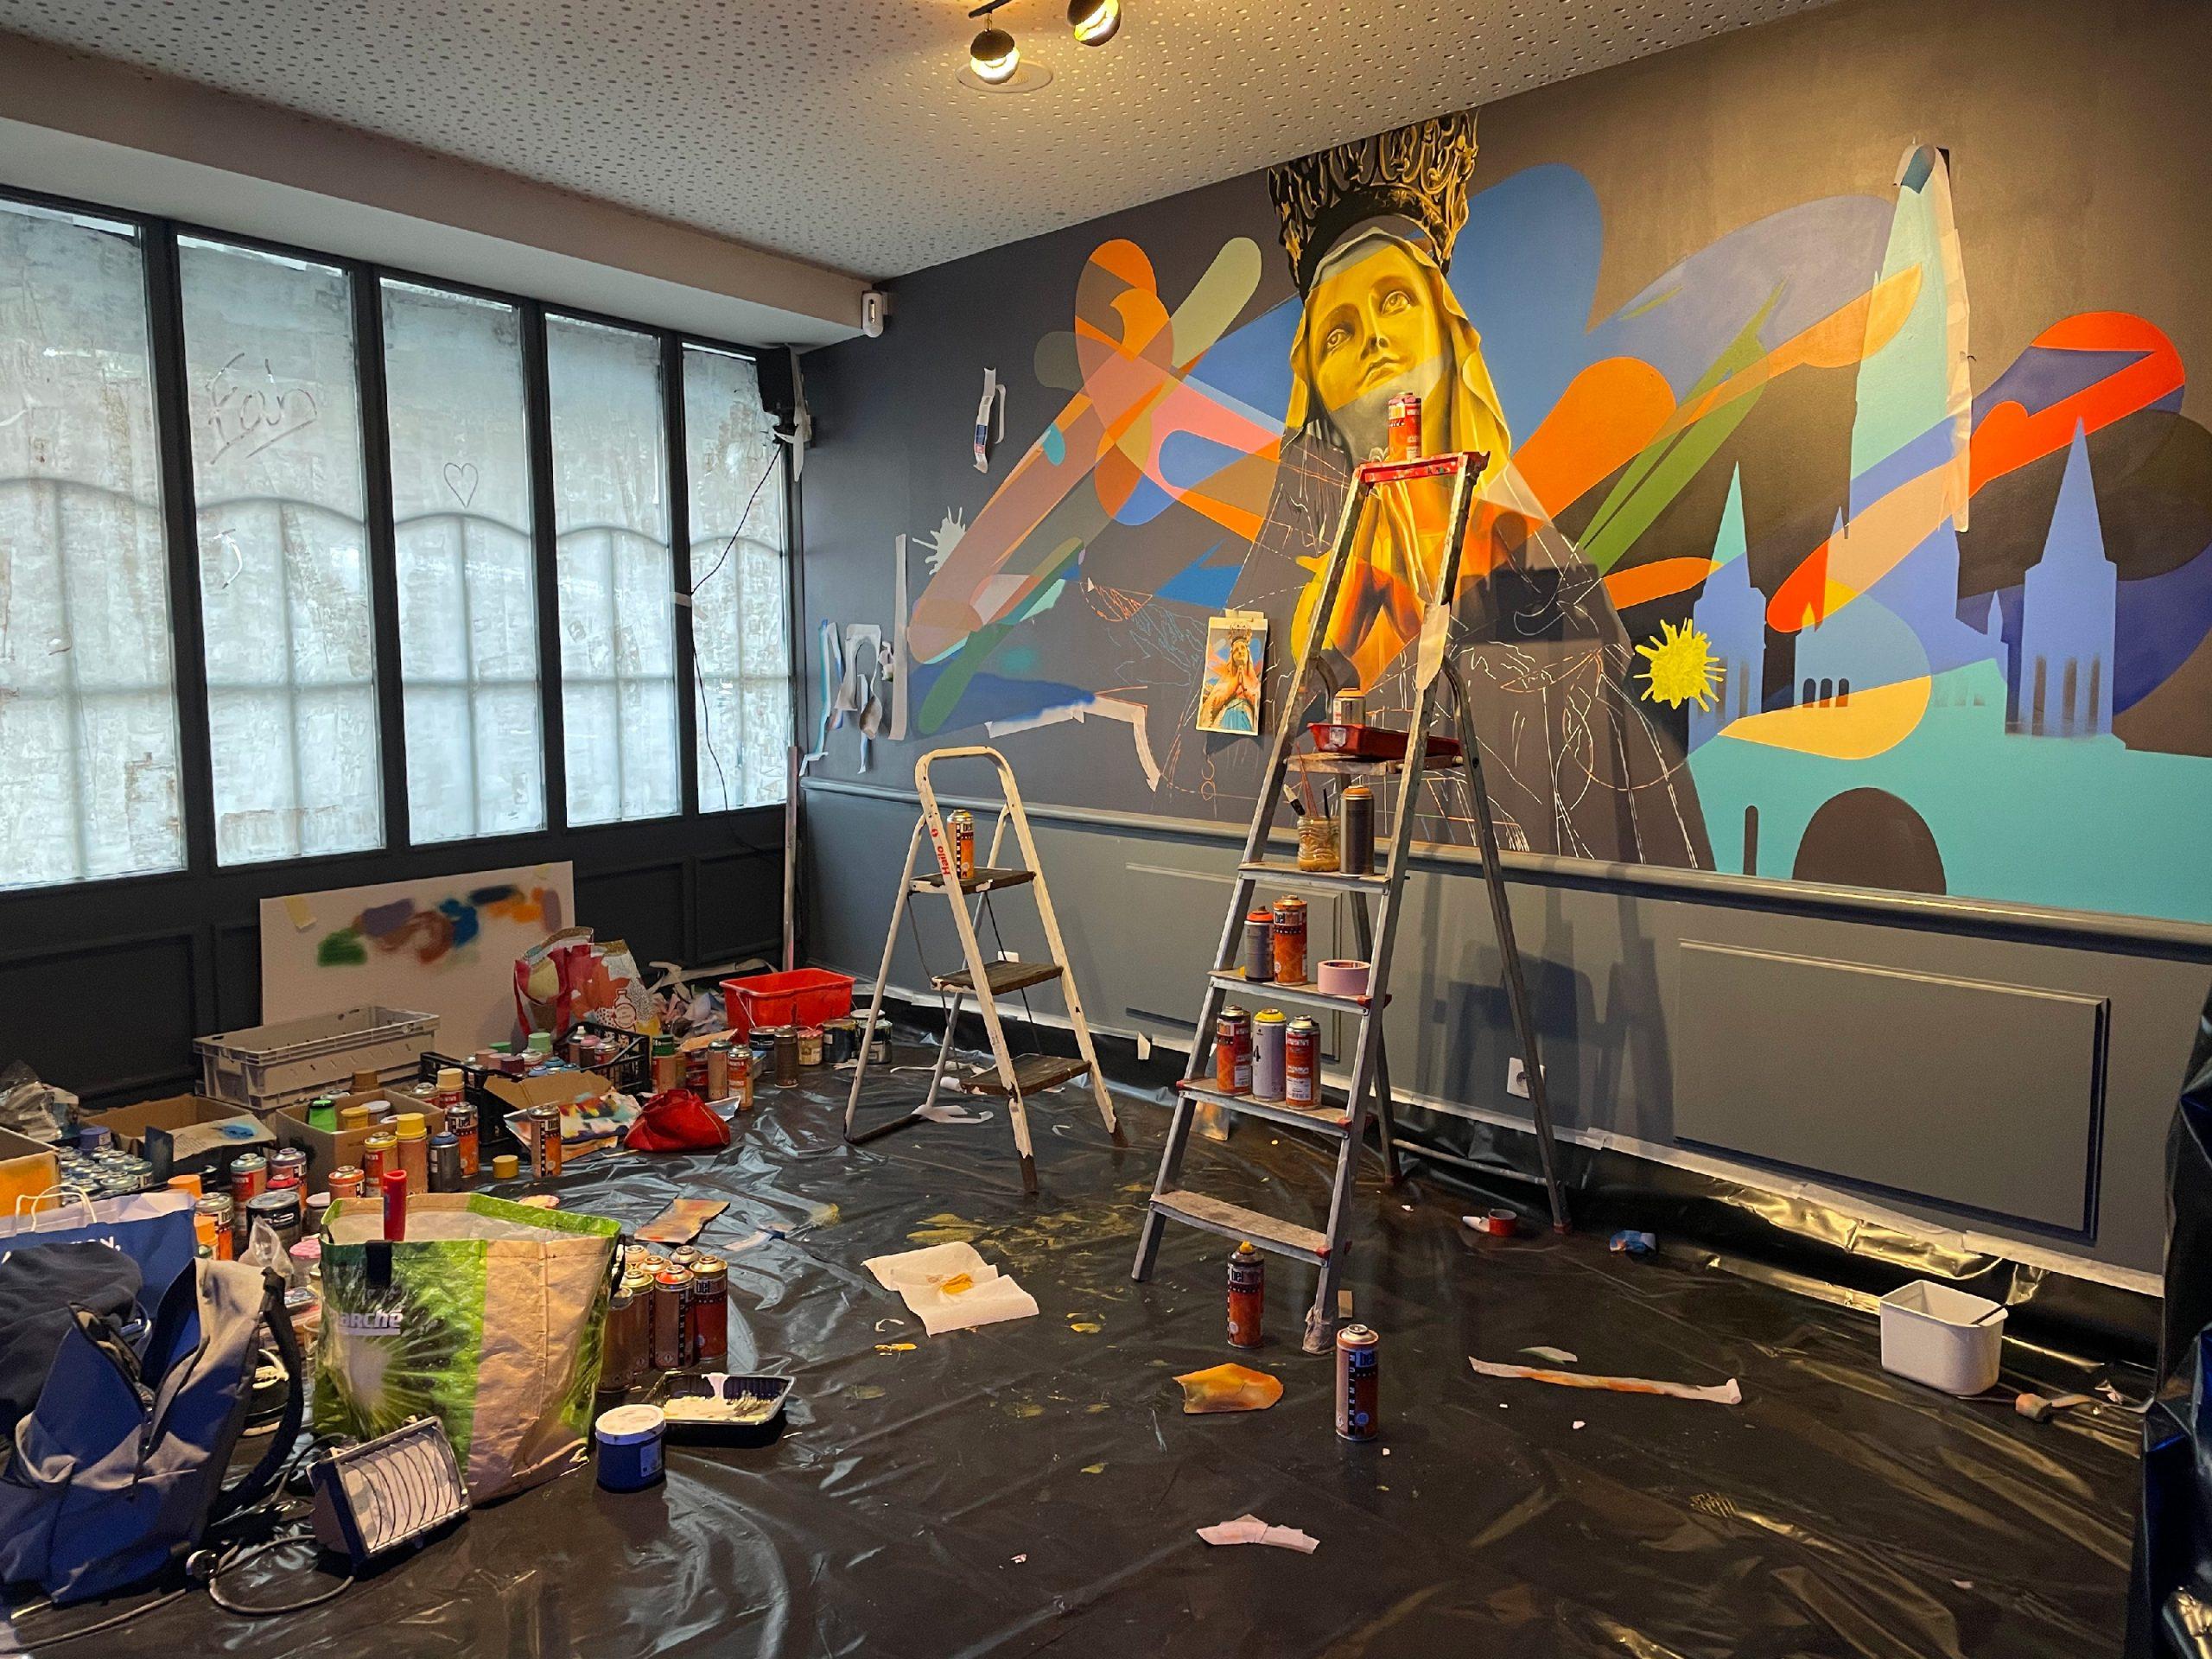 decoration-restaurant-moderne-contemporain-graffiti-street-art